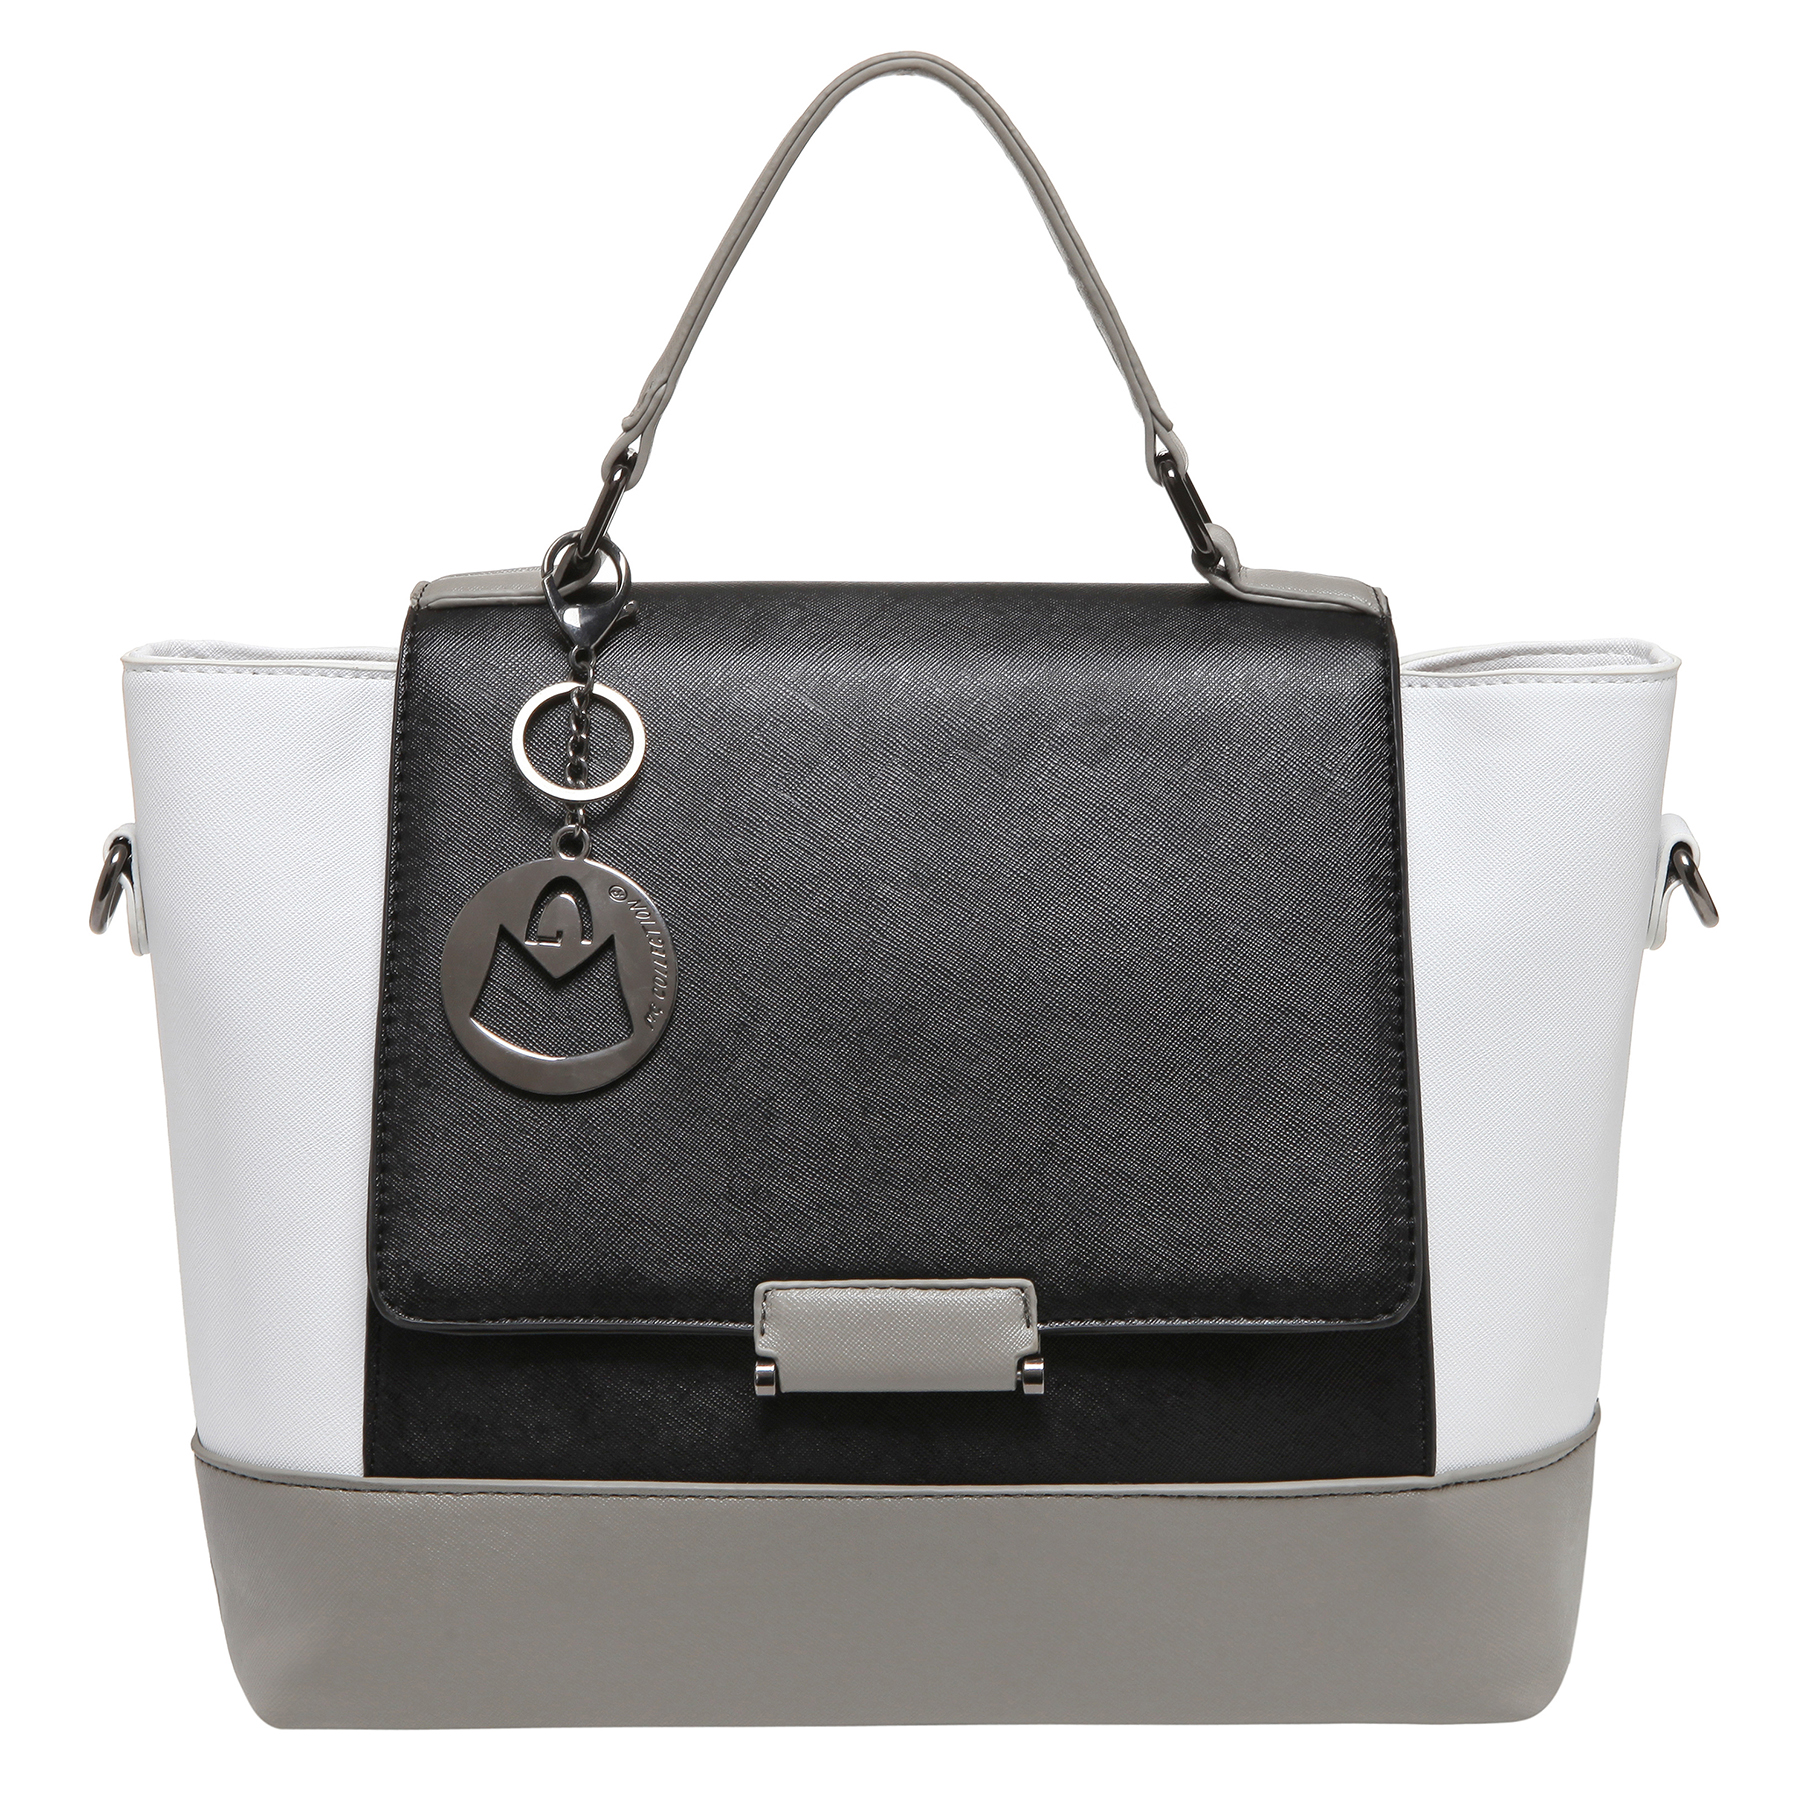 mg-collection-meryl-top-handle-tote-handbag-tb-h0651blk-2.jpg